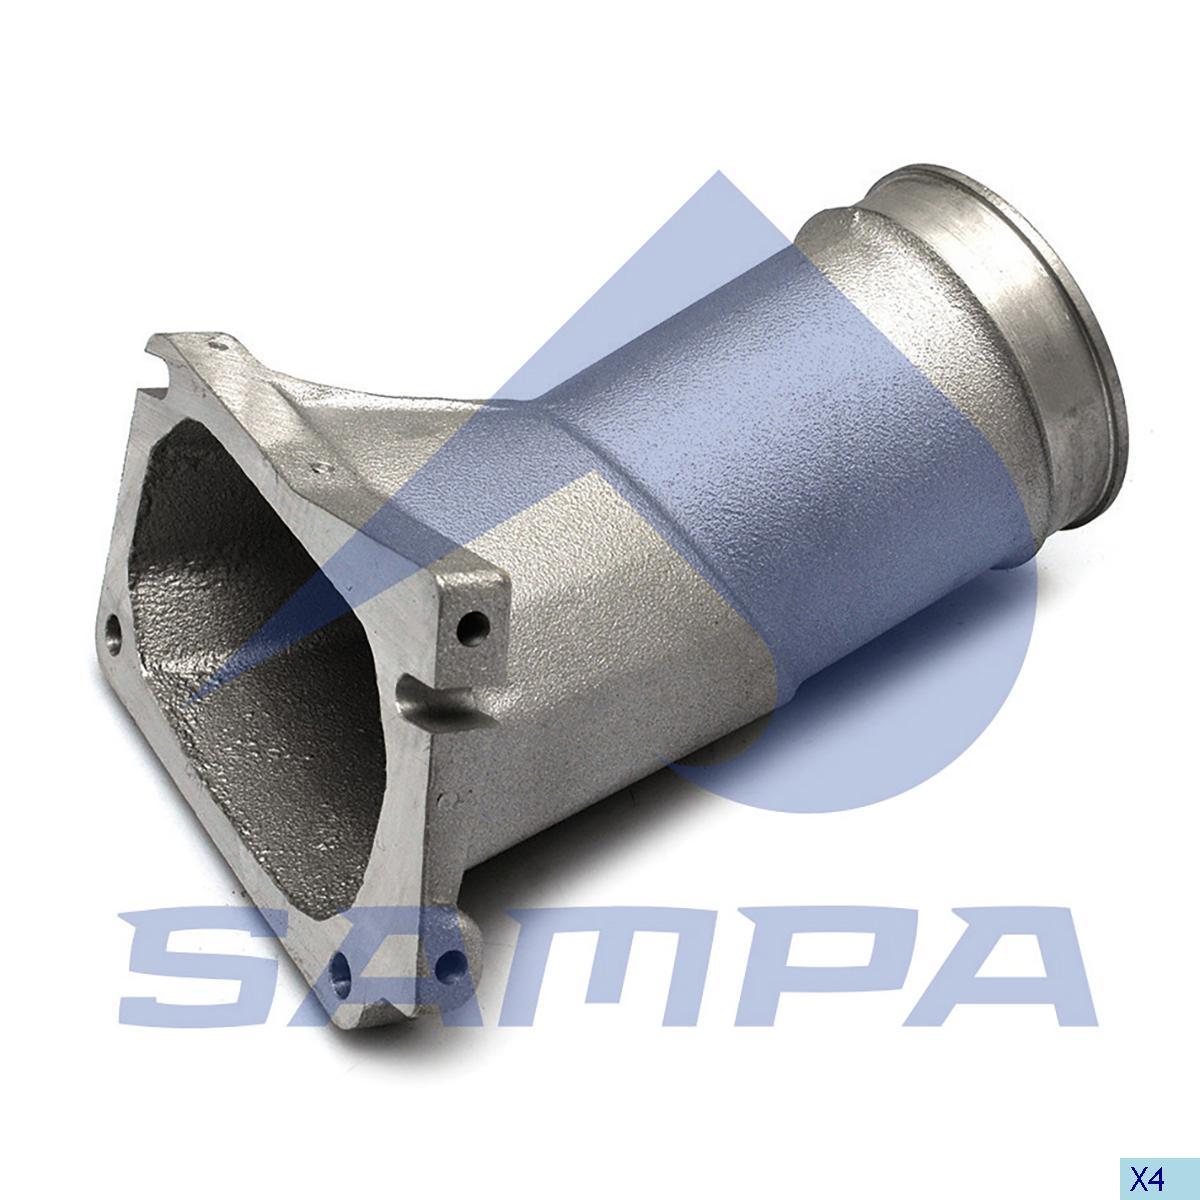 Pipe, Turbocharger, Volvo, Engine